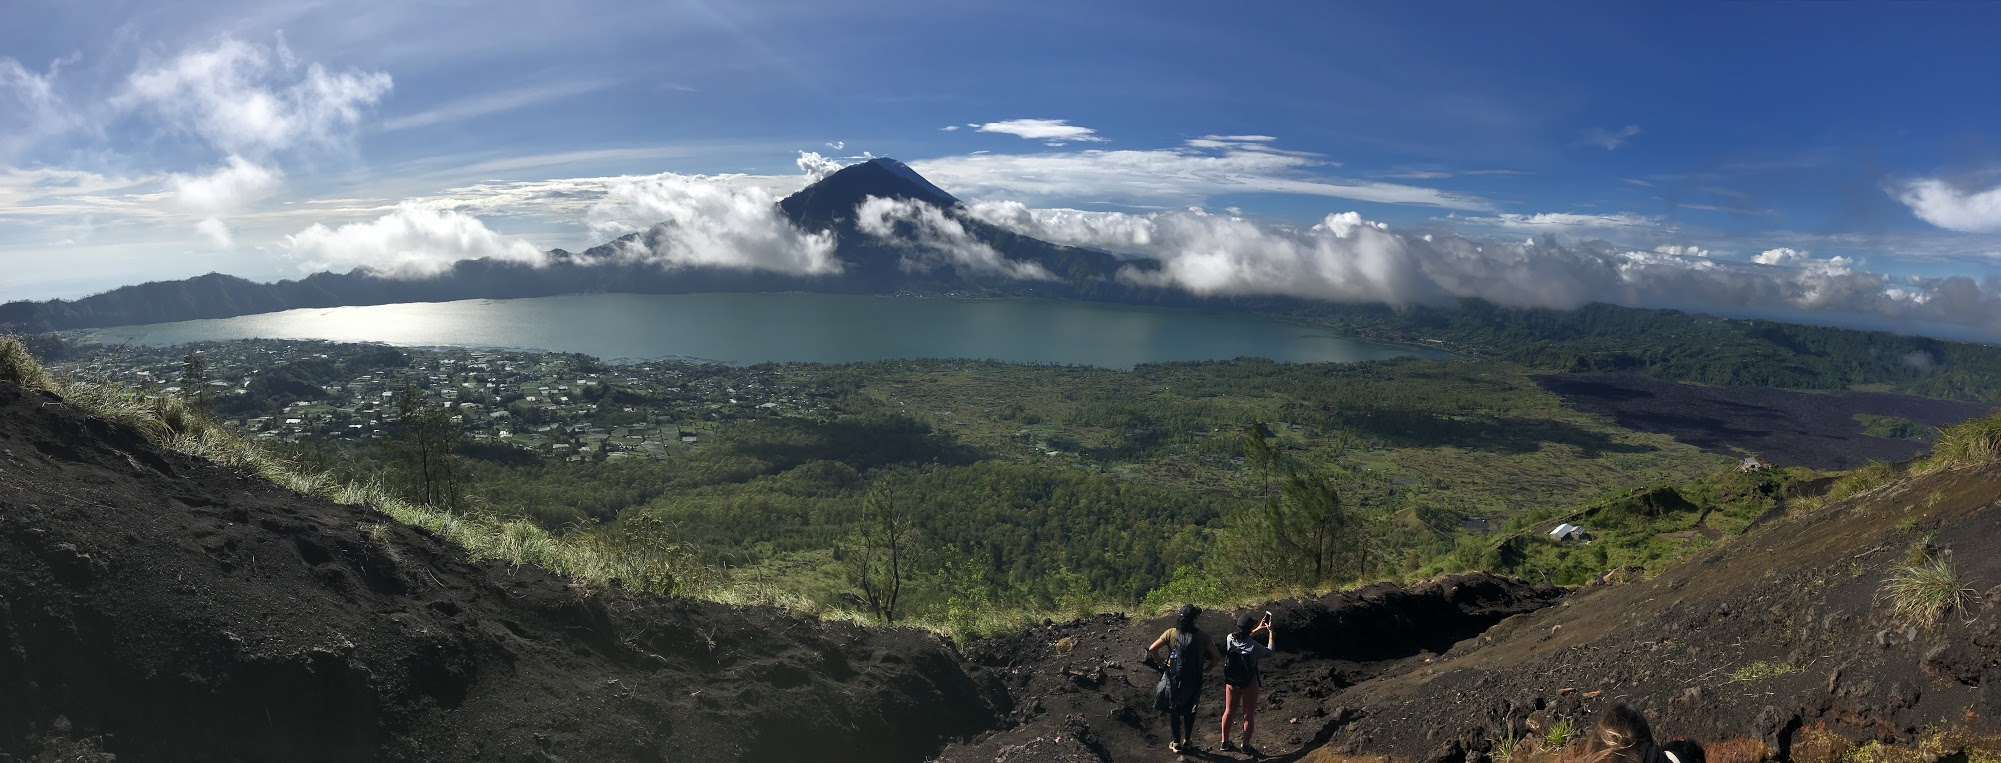 Mt Batur.JPEG